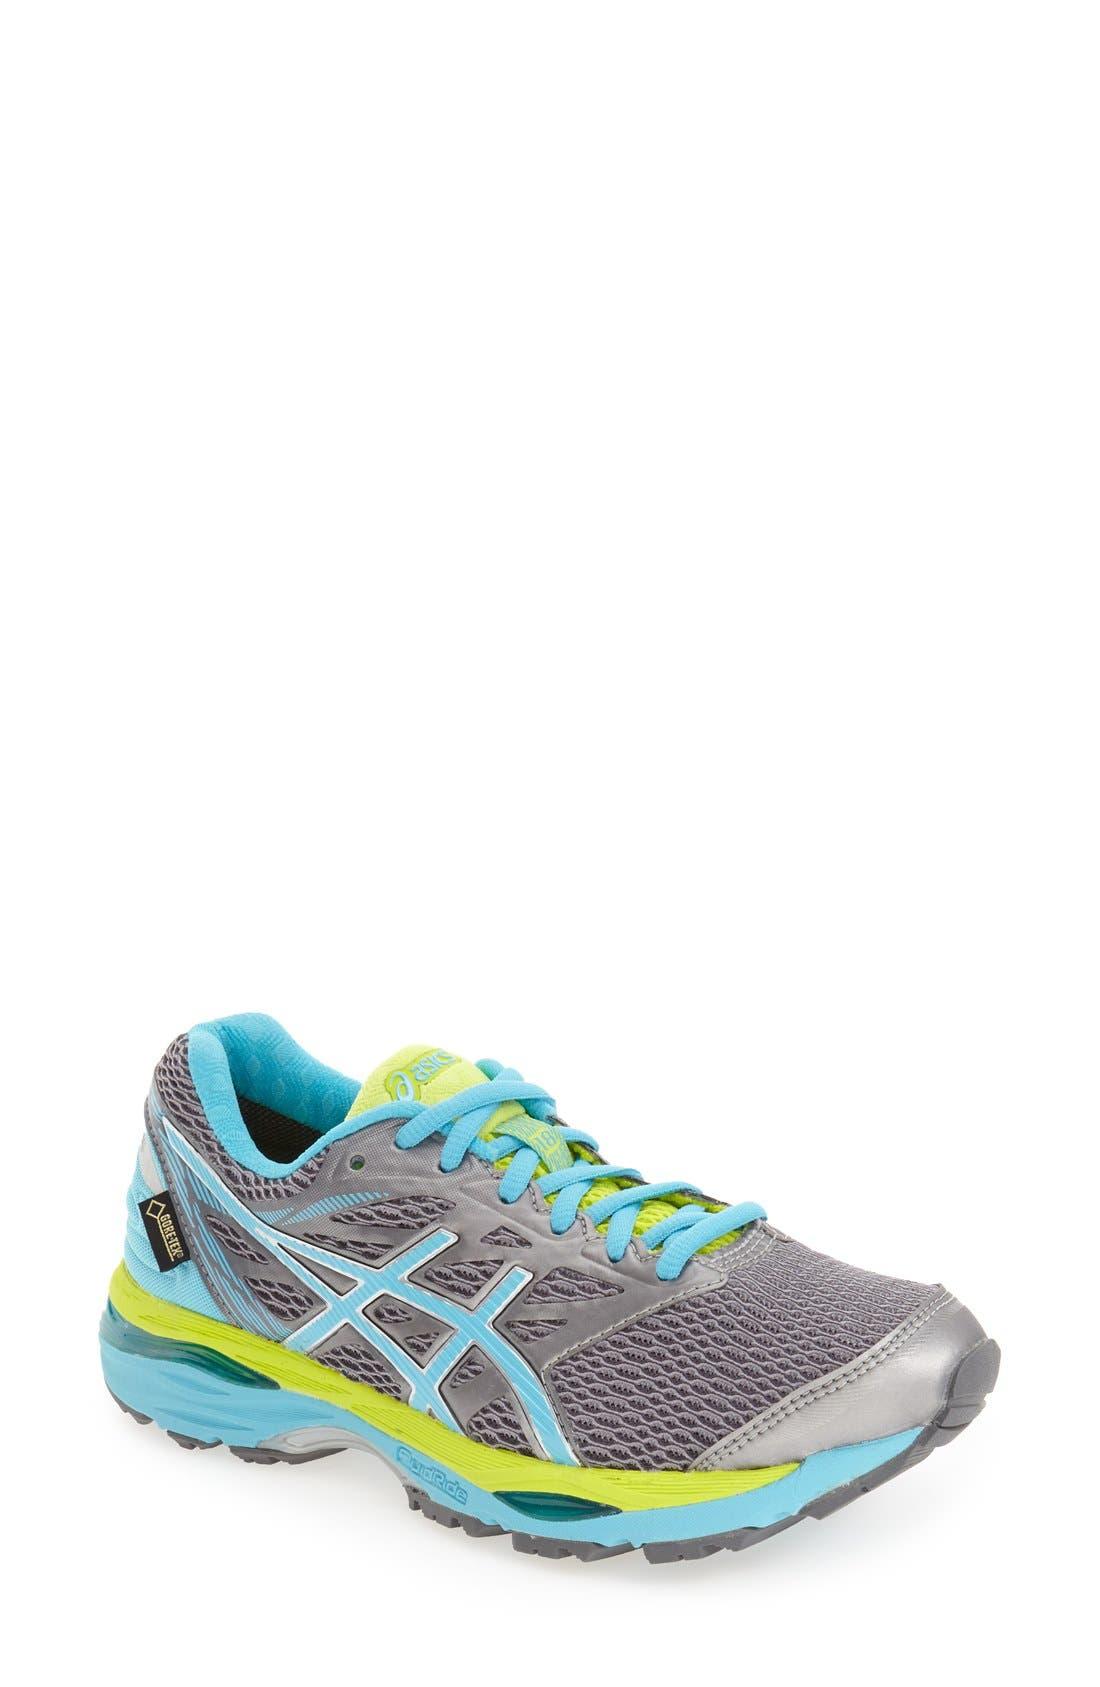 Alternate Image 1 Selected - ASICS® 'GEL-Cumulus® 18' Gore-Tex® Running Shoe (Women)